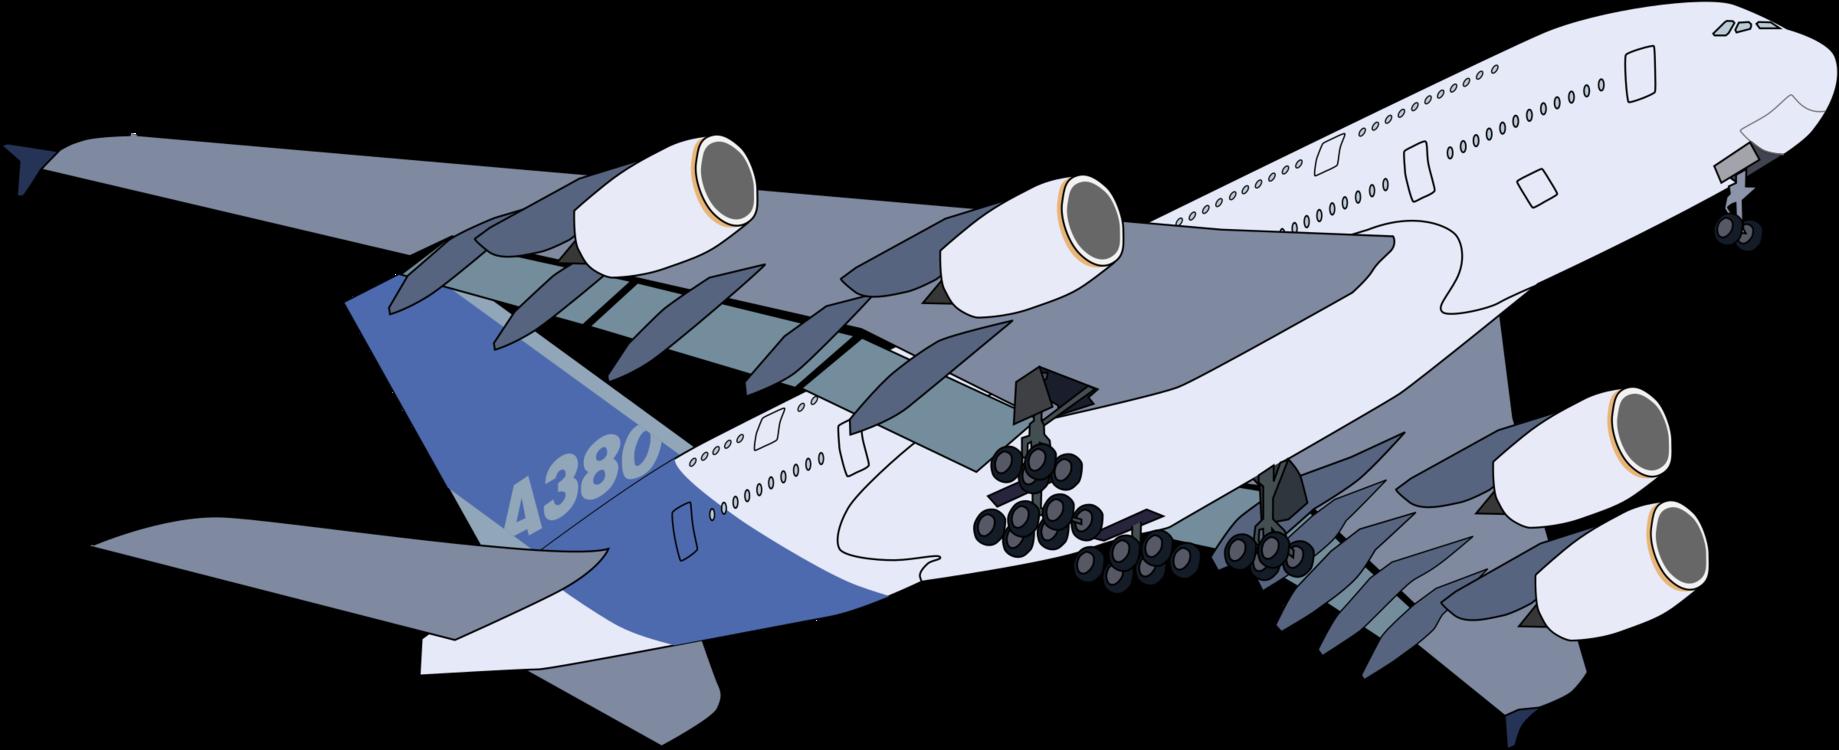 Spaceplane,Angle,Flap